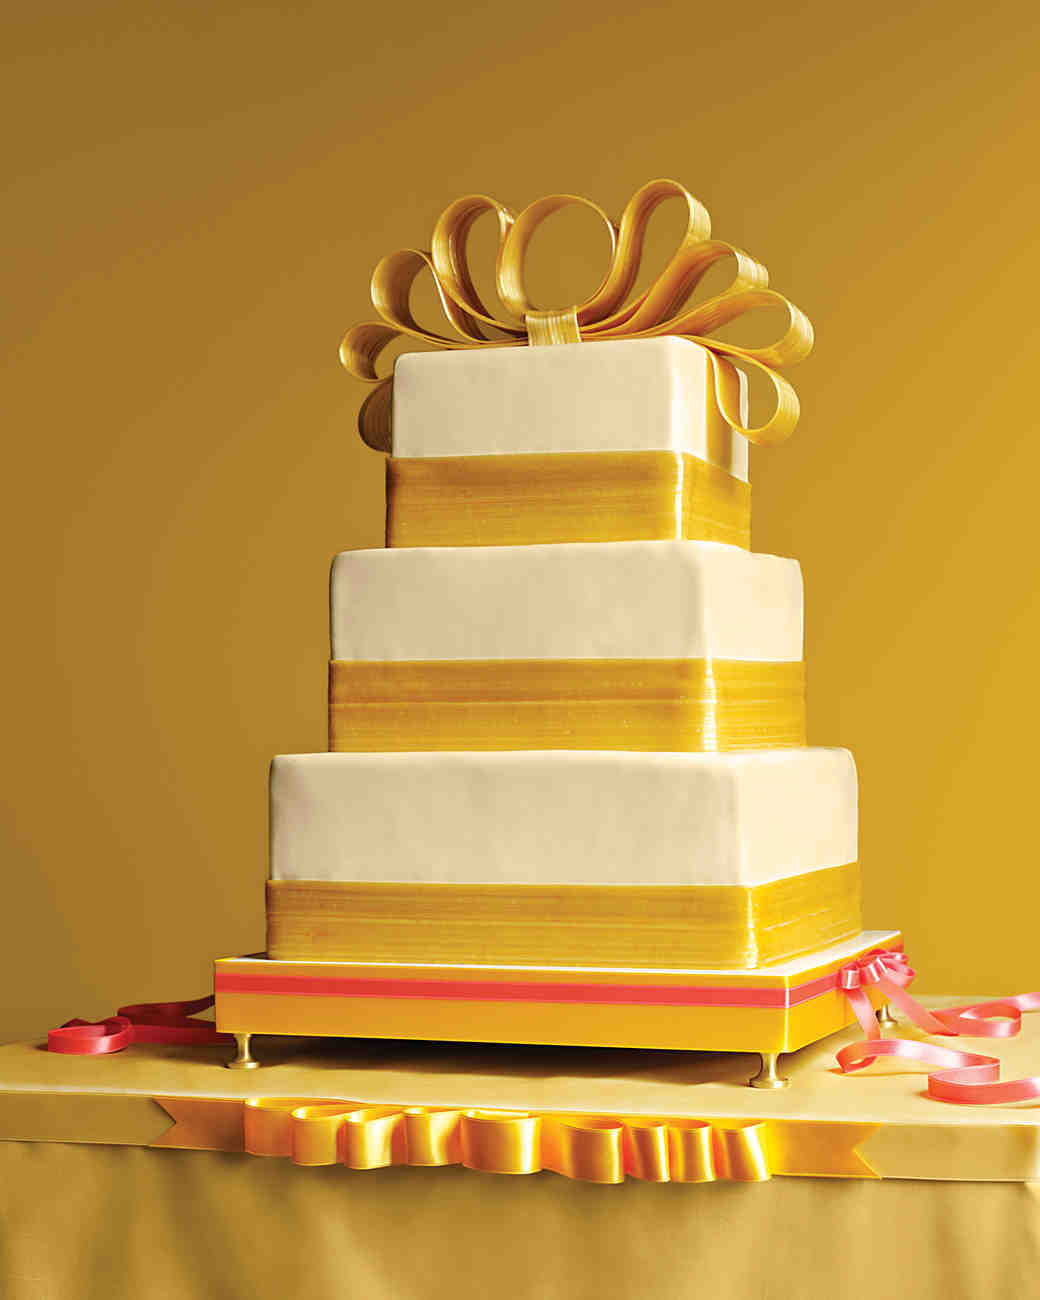 bow-cakes-mwd104284-gold-0515.jpg